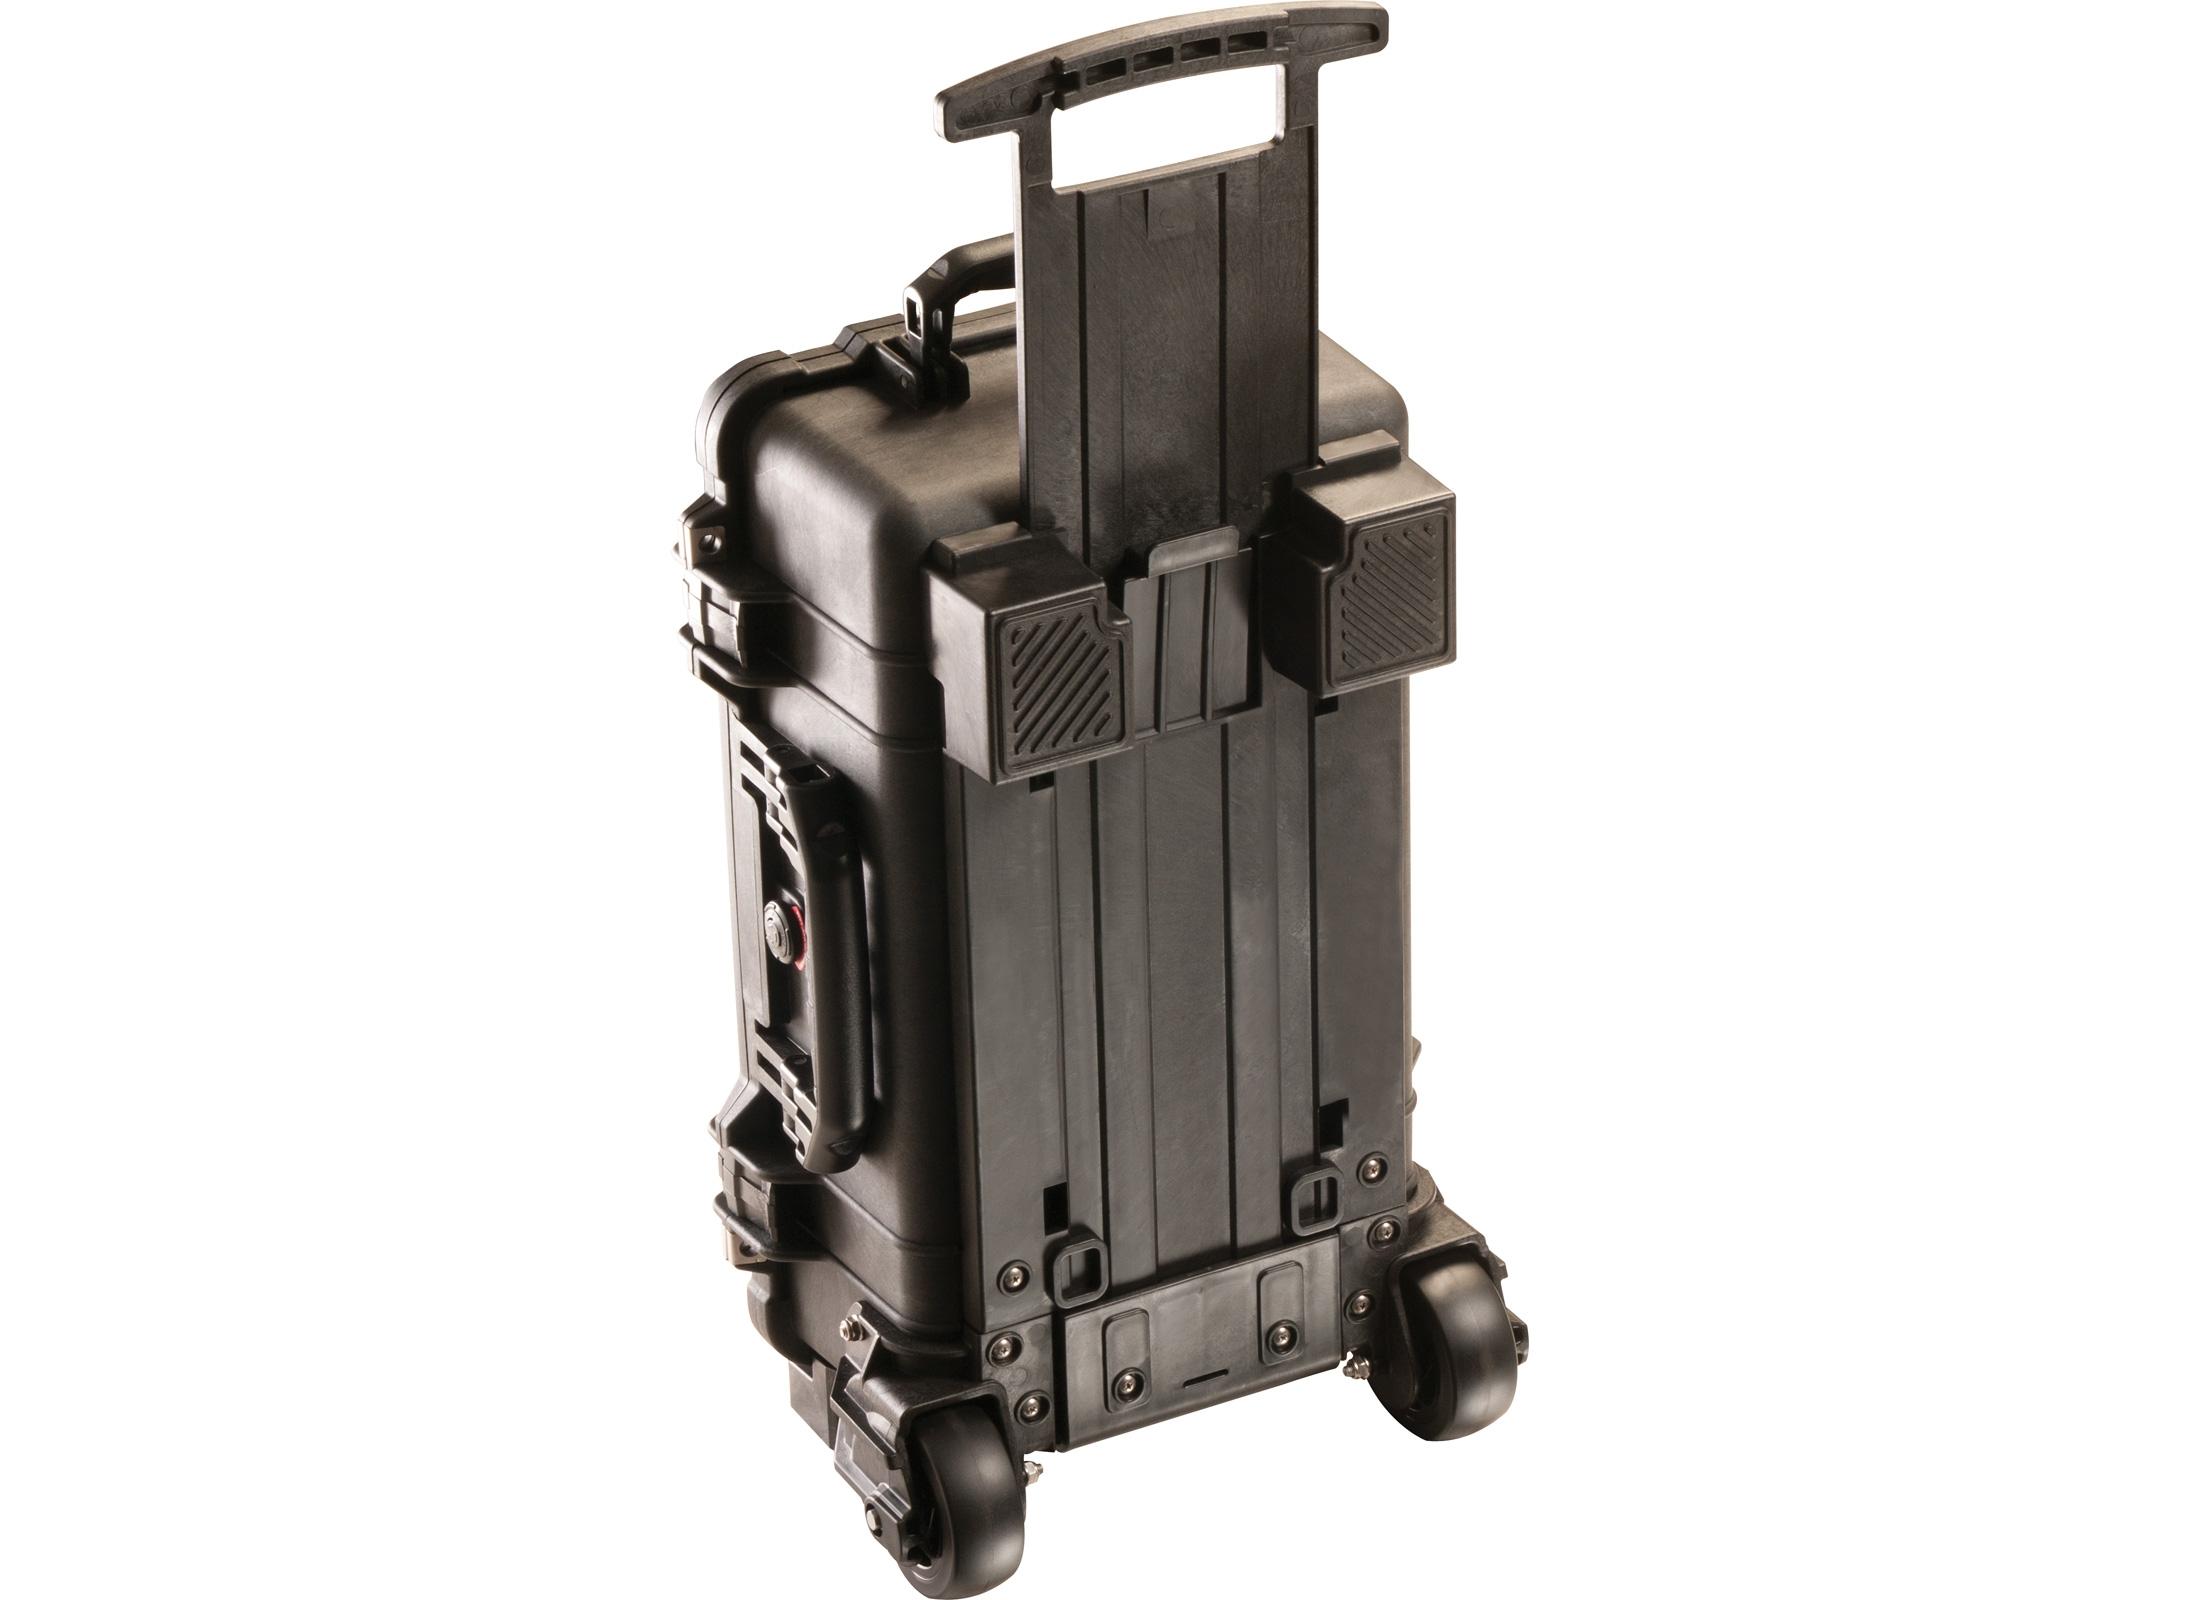 peli 15100 0019 110e equipment koffer trolley g nstig. Black Bedroom Furniture Sets. Home Design Ideas